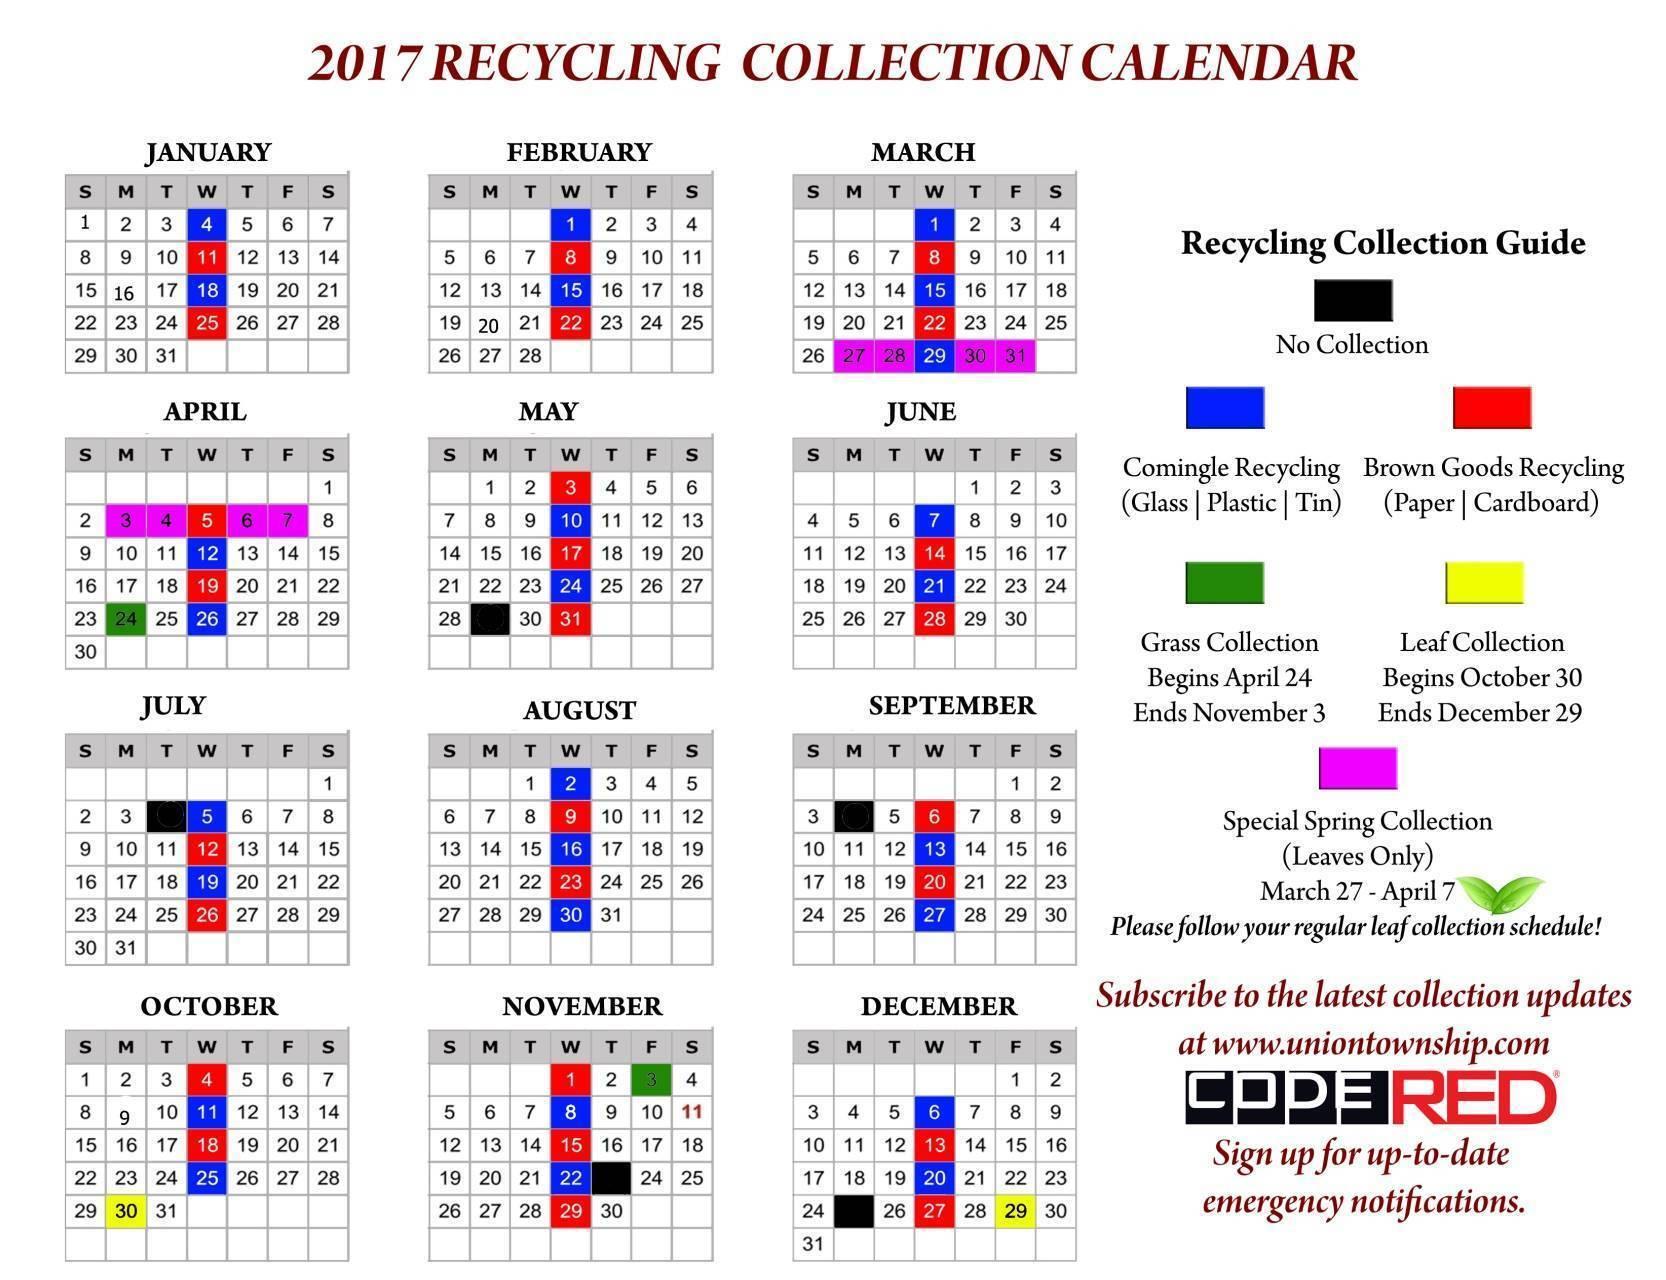 e39df5a6cfca36d7c2e4_fd845336e3e508e62343_recycle_schedule.jpg